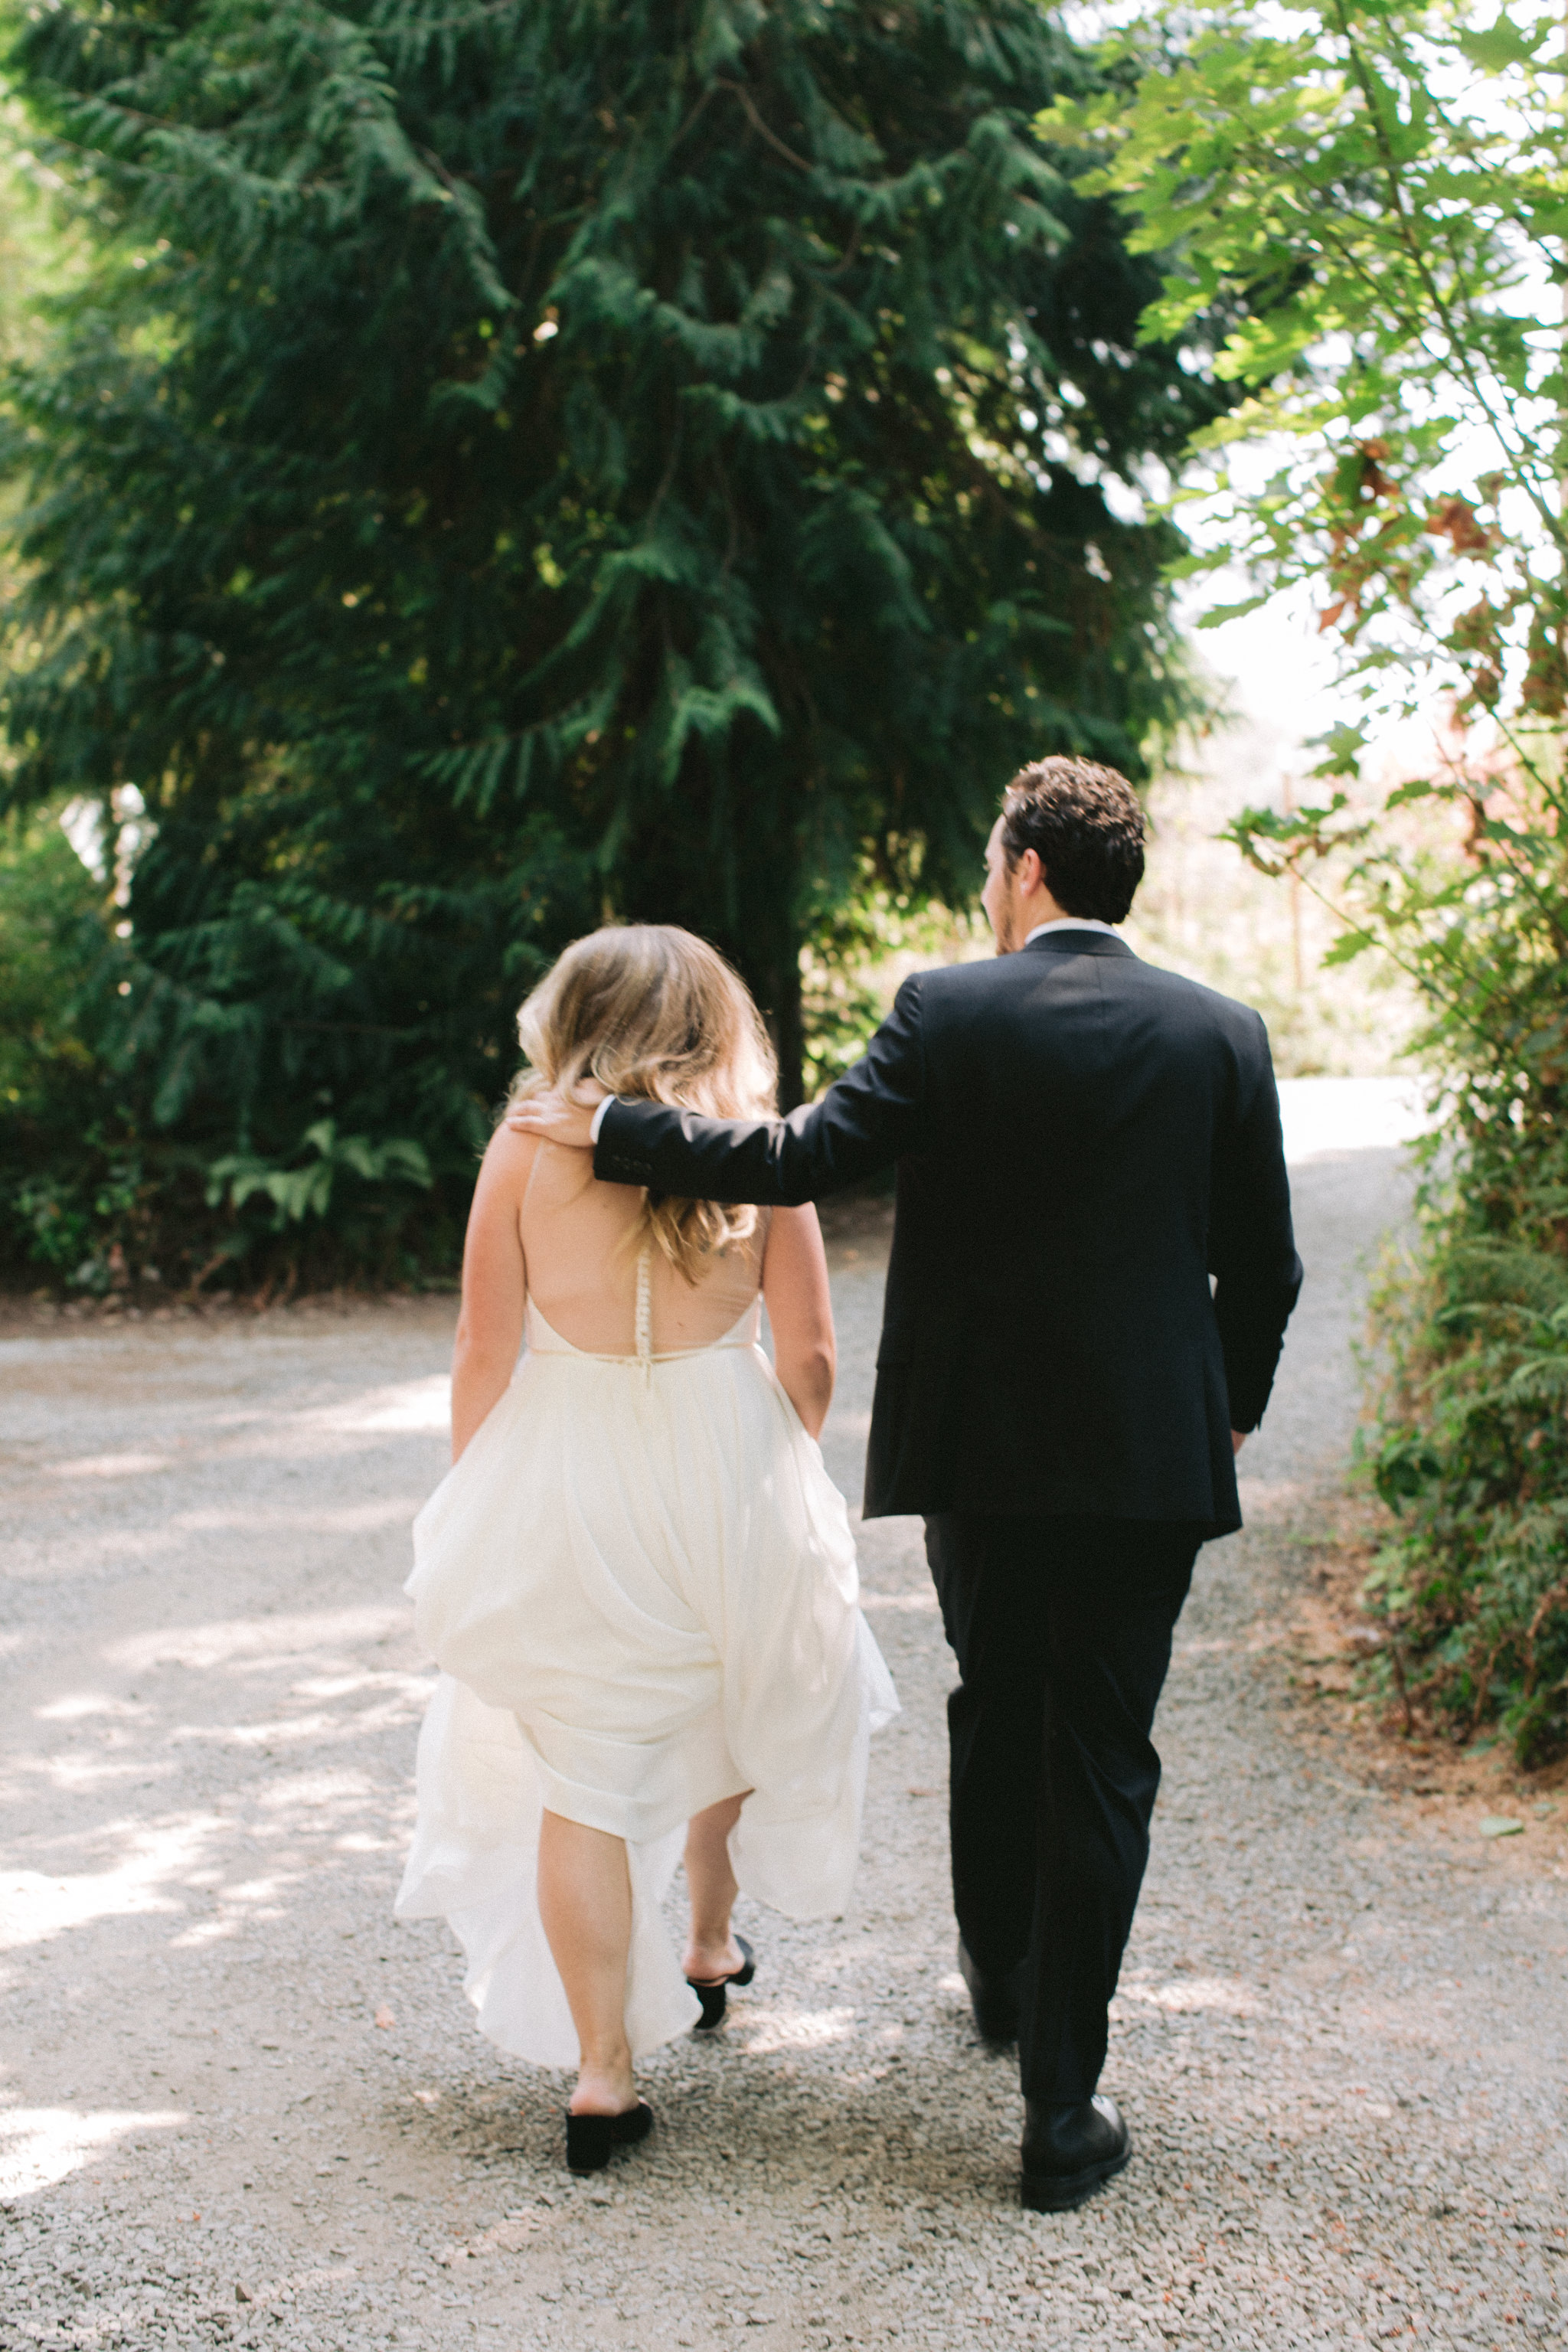 Backyard-Bainbridge-Island-Wedding-Alycia-Lovell-Photography-41.JPG